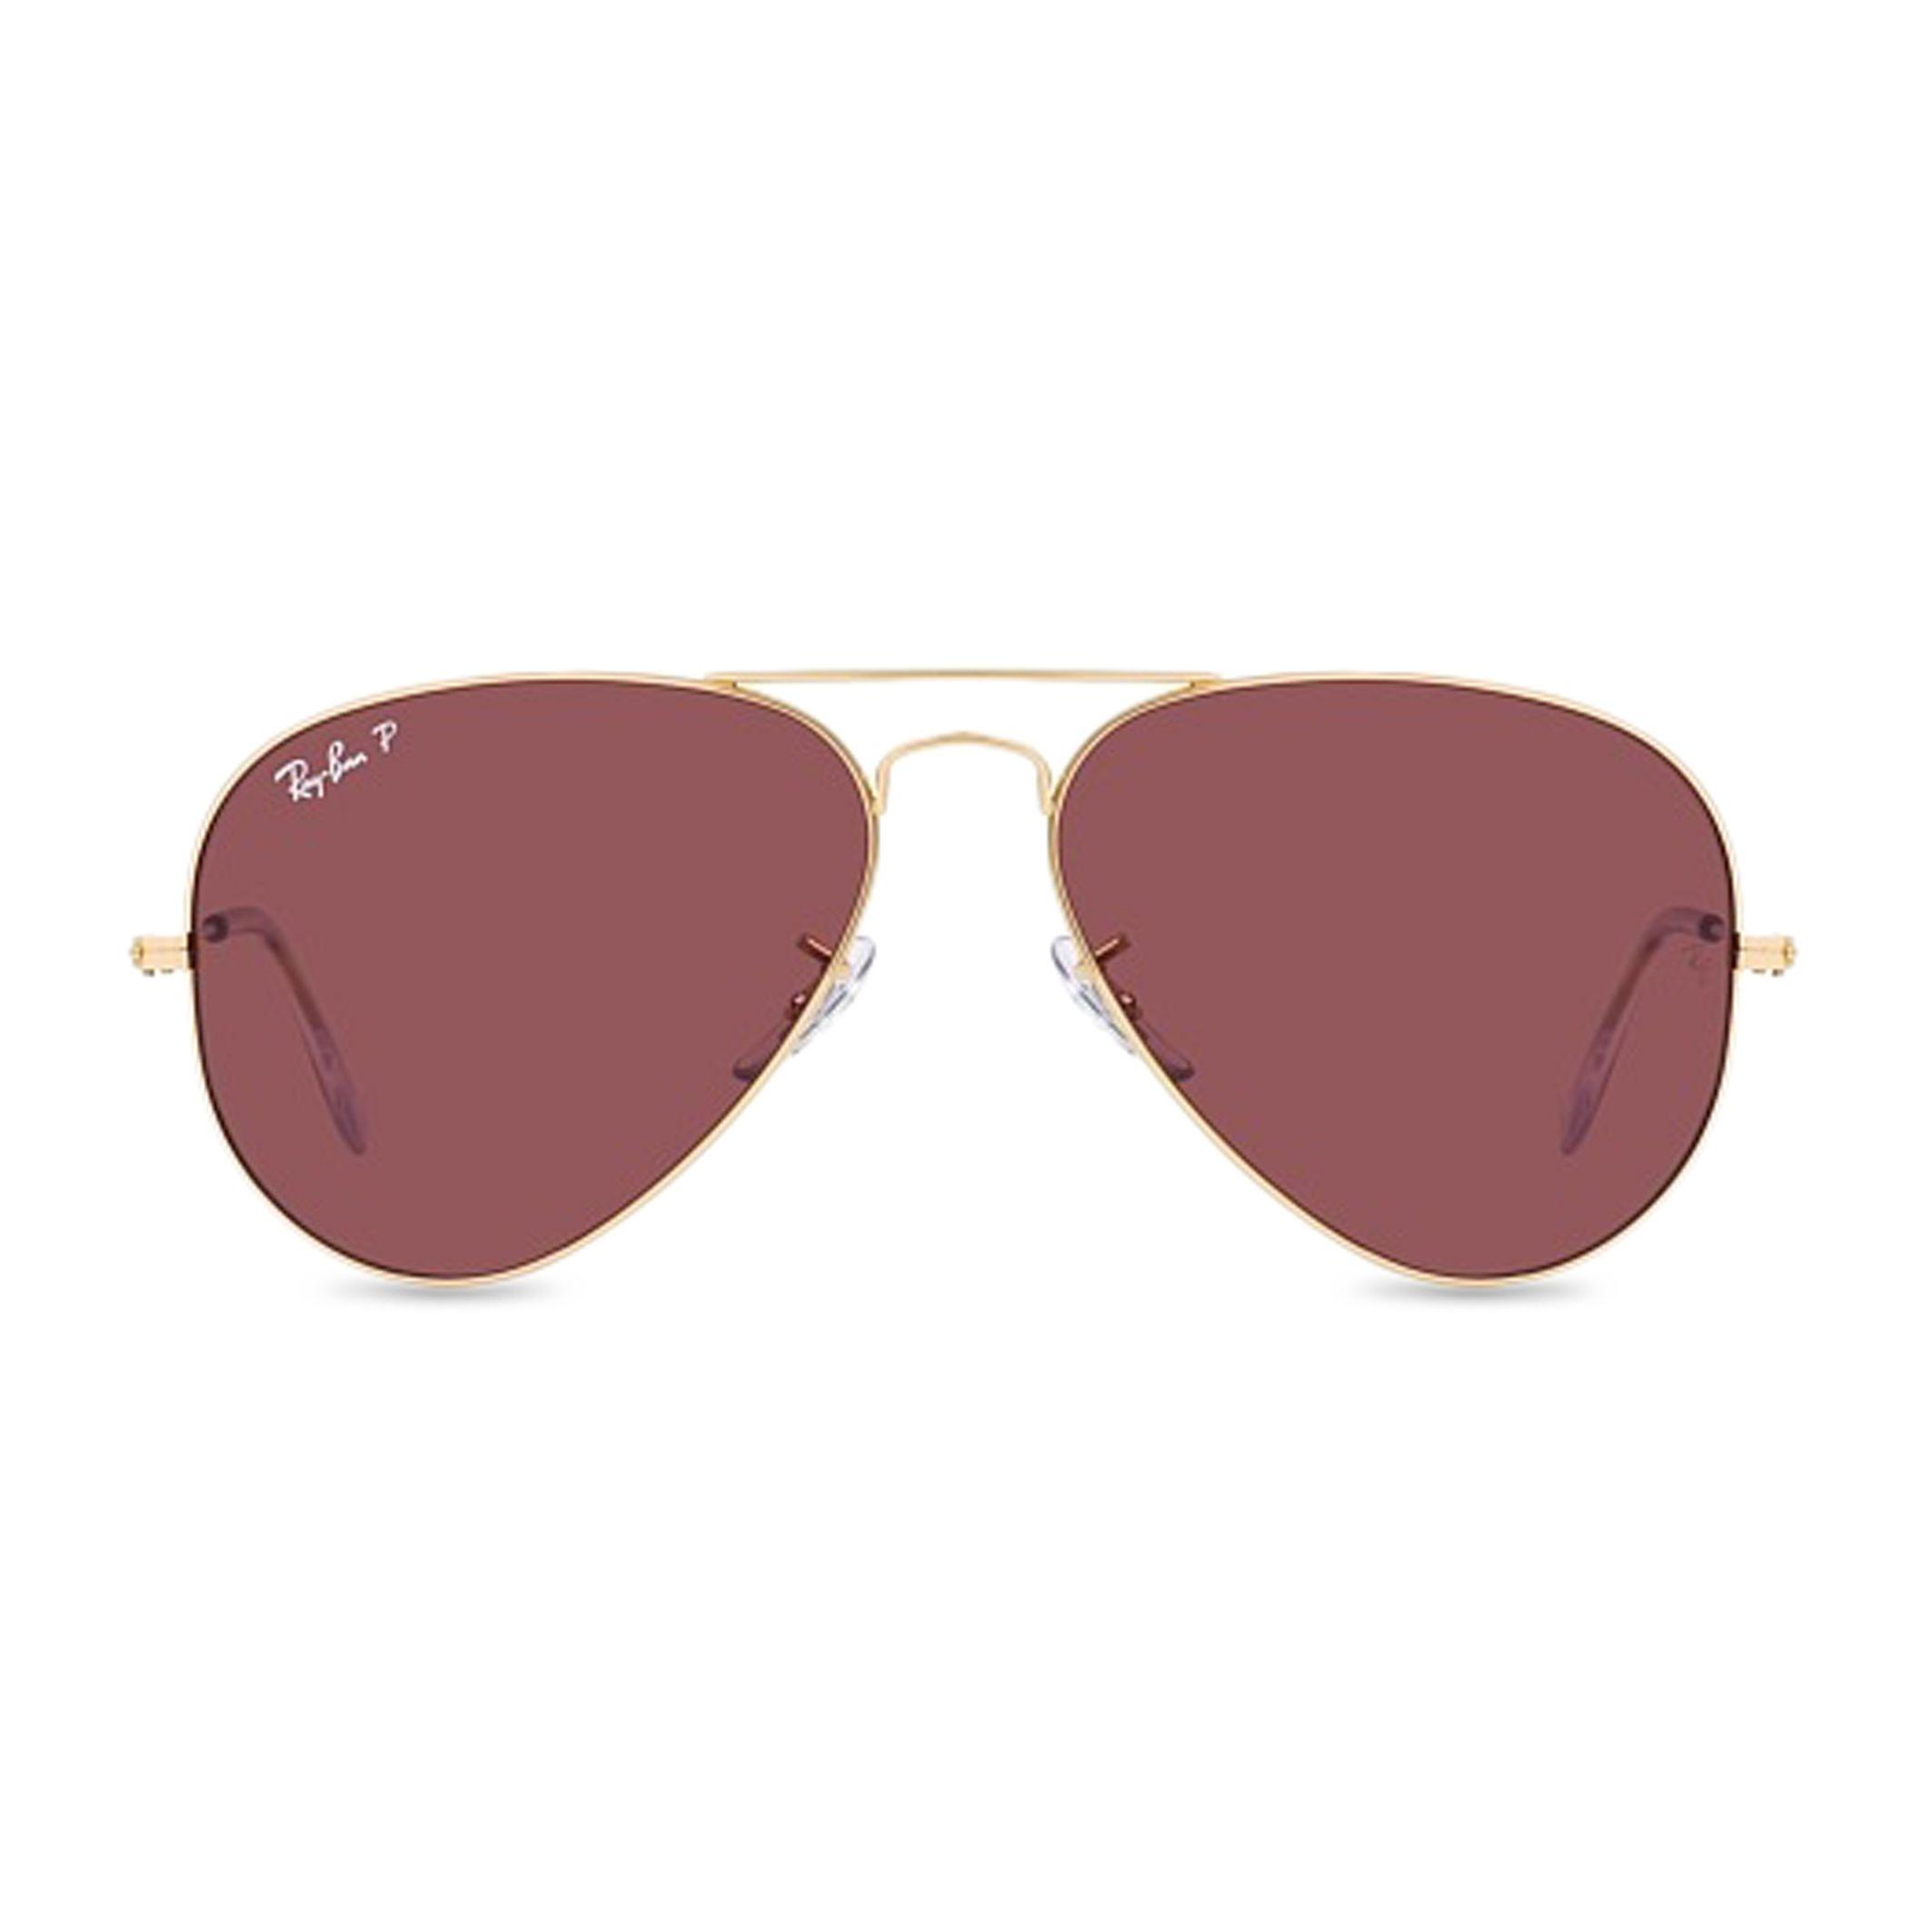 Ray-Ban Unisexs Sunglasses